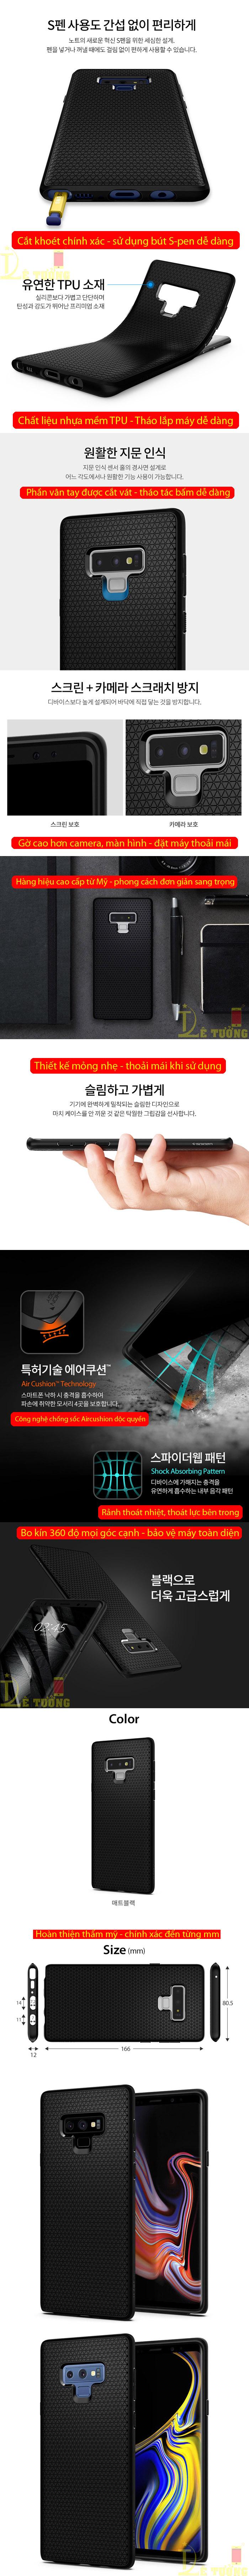 Ốp lưng Galaxy Note 9 Spigen Liquid Air Armor nhựa mềm ( hàng USA ) 3